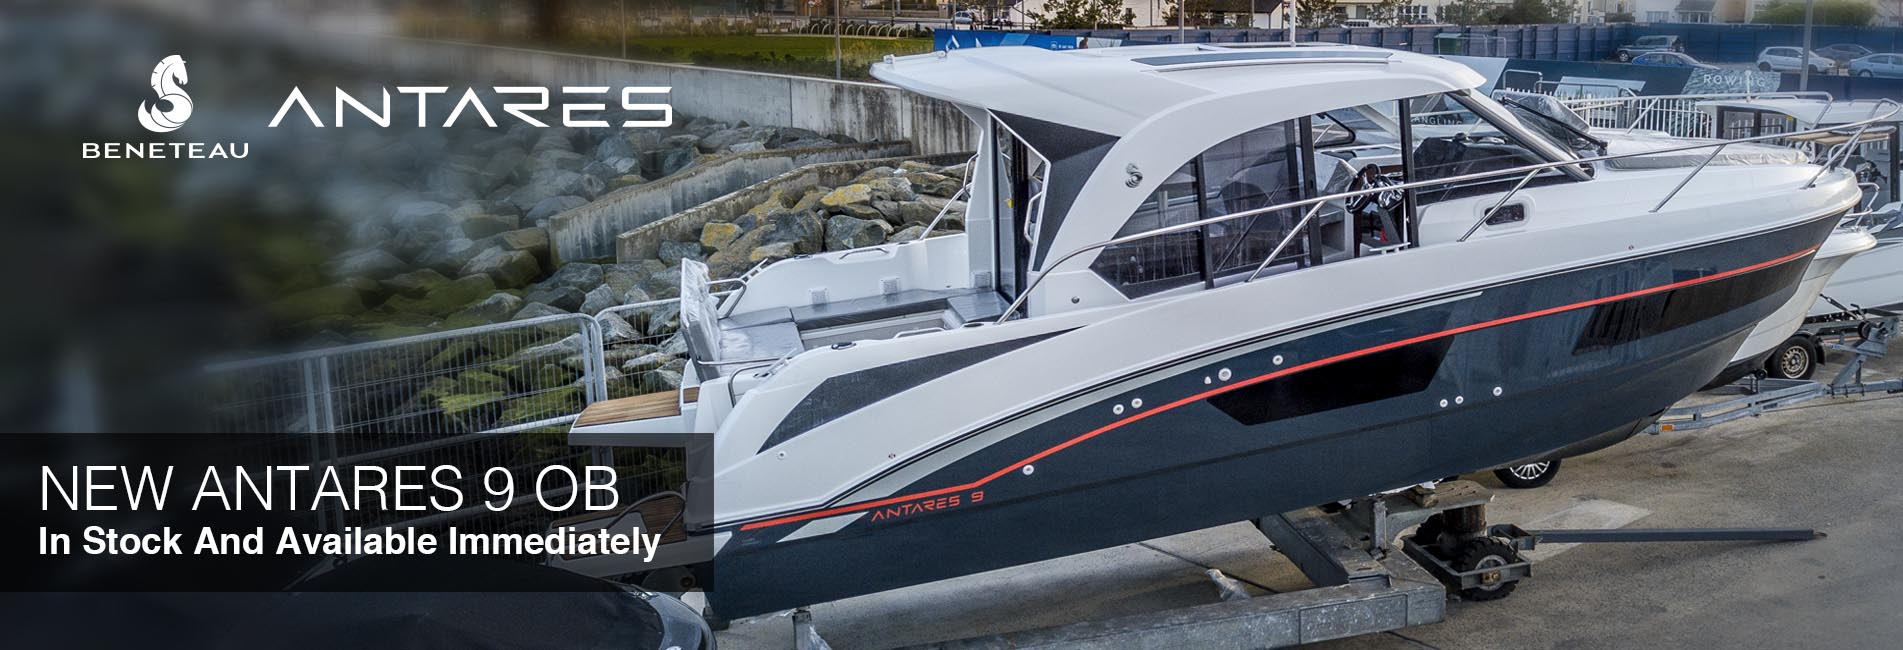 New Beneteau Antares 9 OB 2019 Cannes Southampton